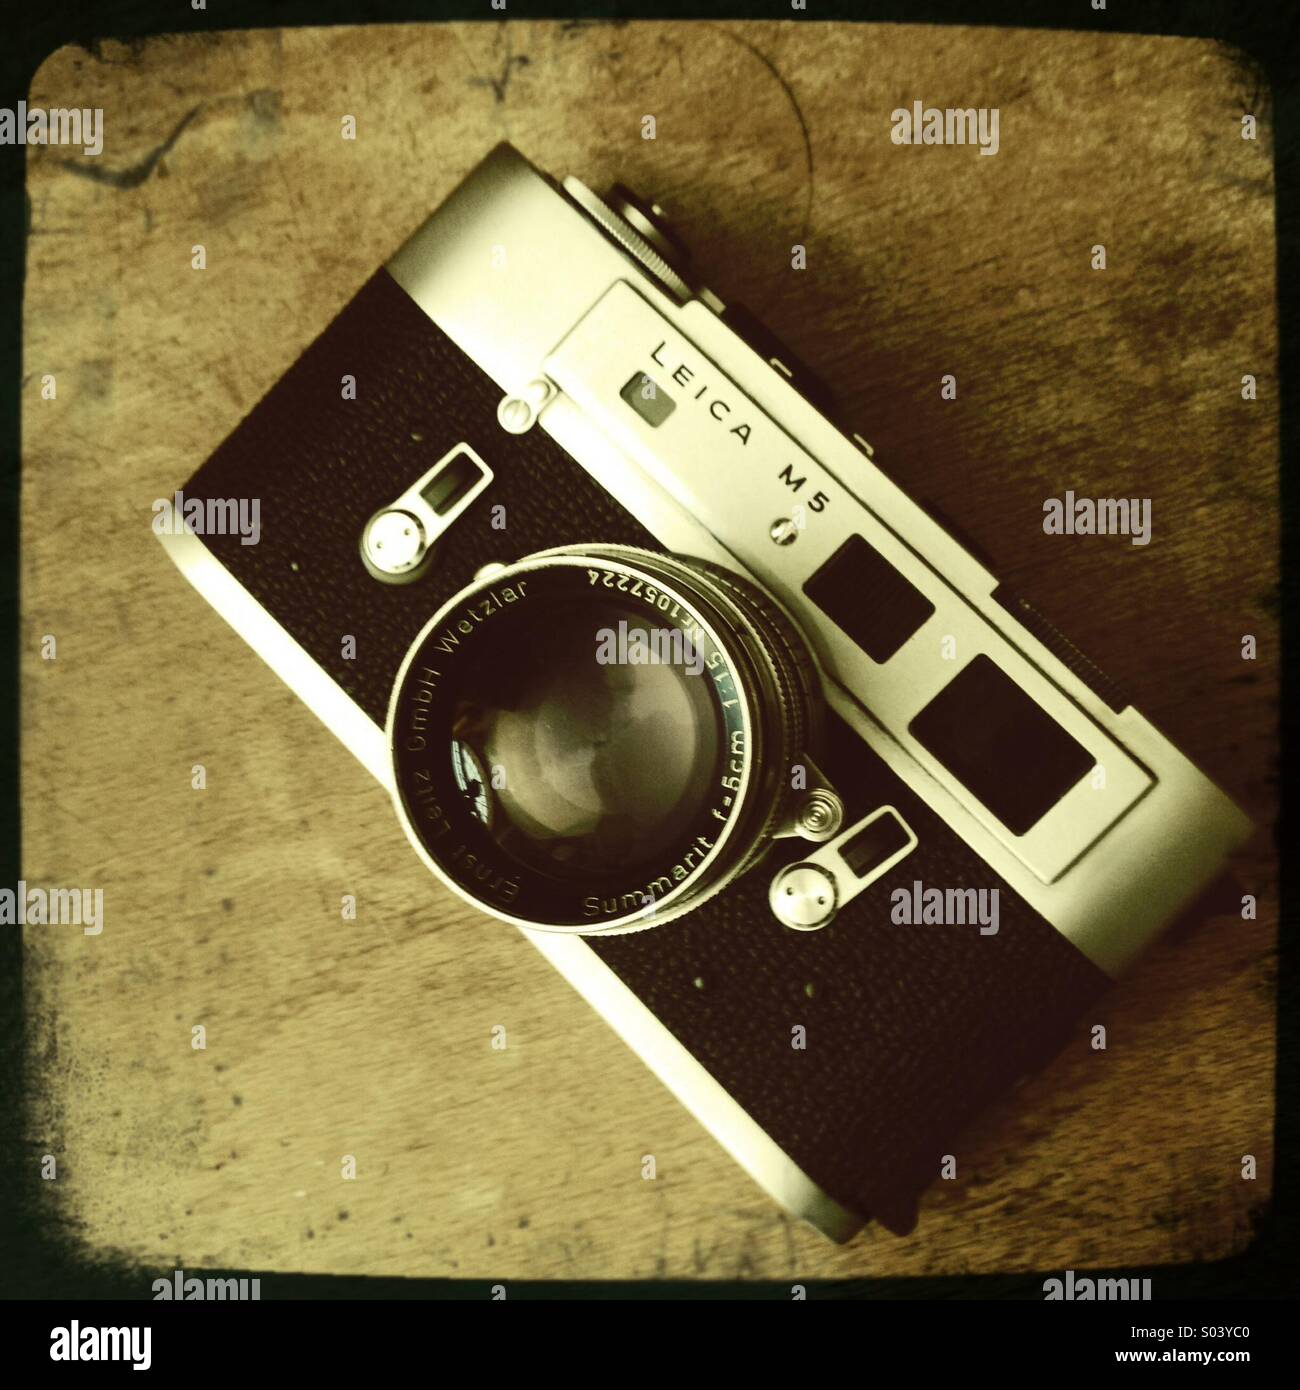 Vintage film camera rangefinder Leica M5 with lens - Stock Image